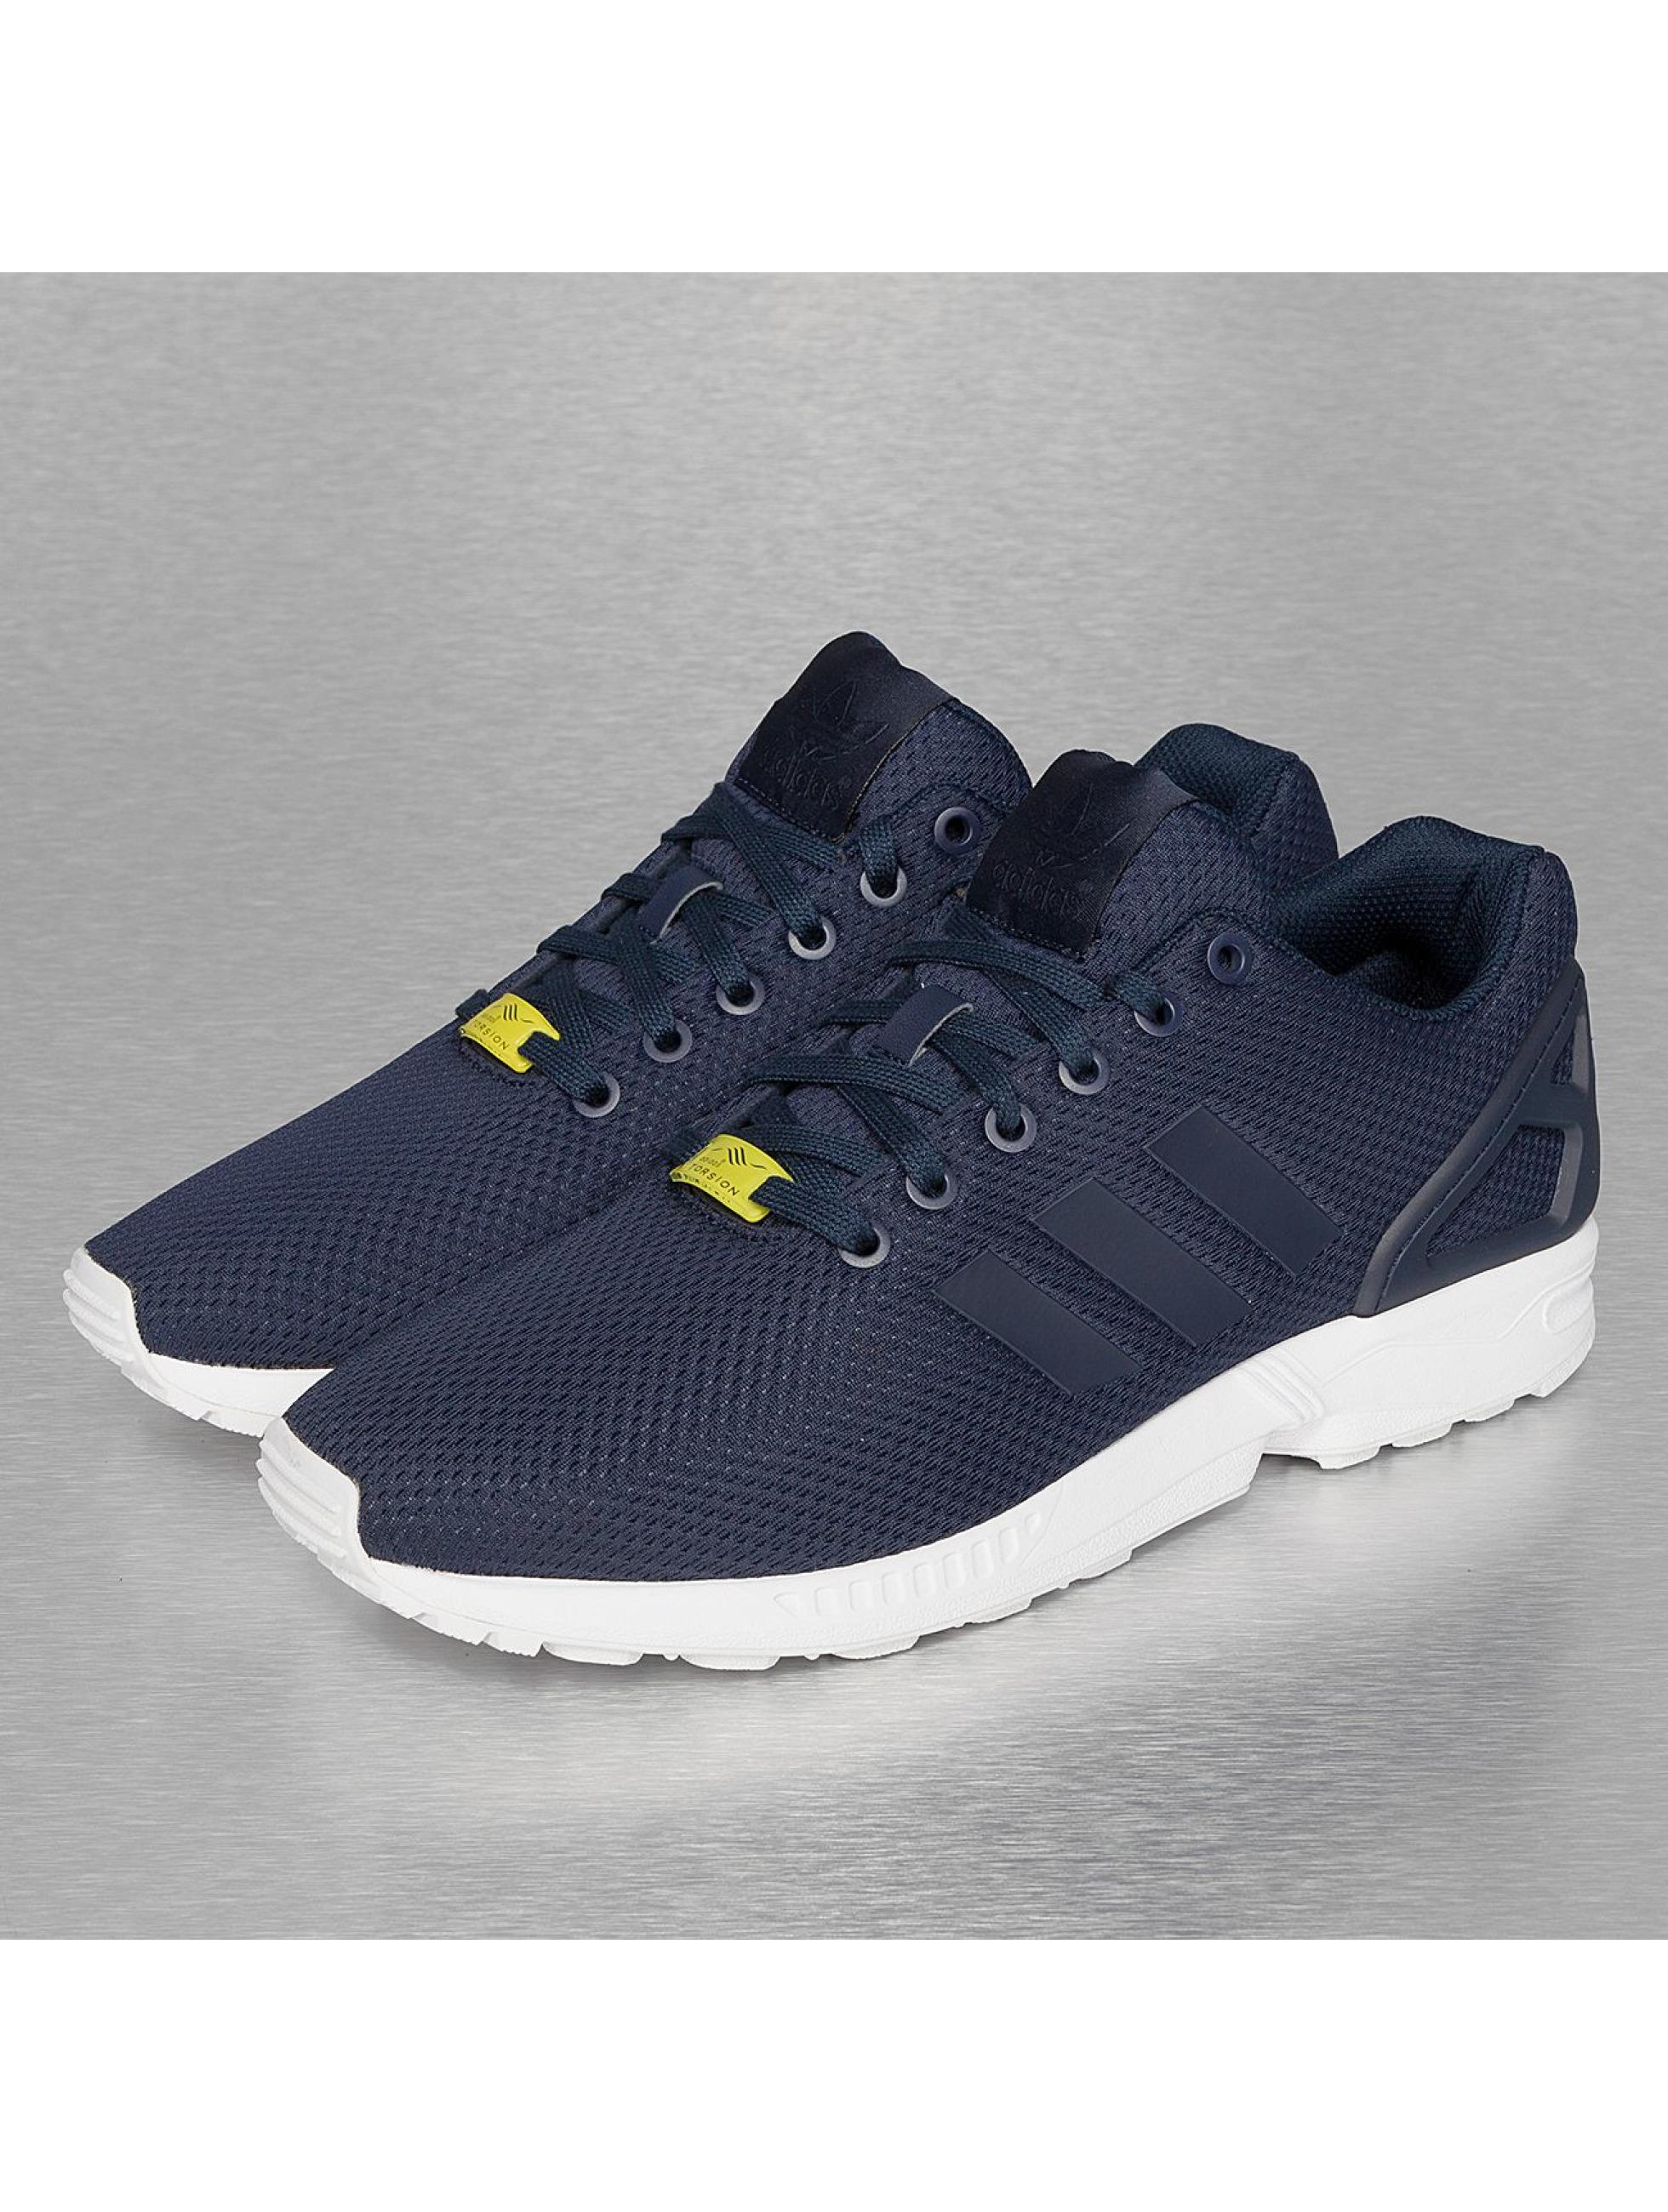 promo code 4120c 34500 ... coupon code for adidas originals zx flux bleu baskets adidas originals  acheter pas cher chaussures 128303 ...